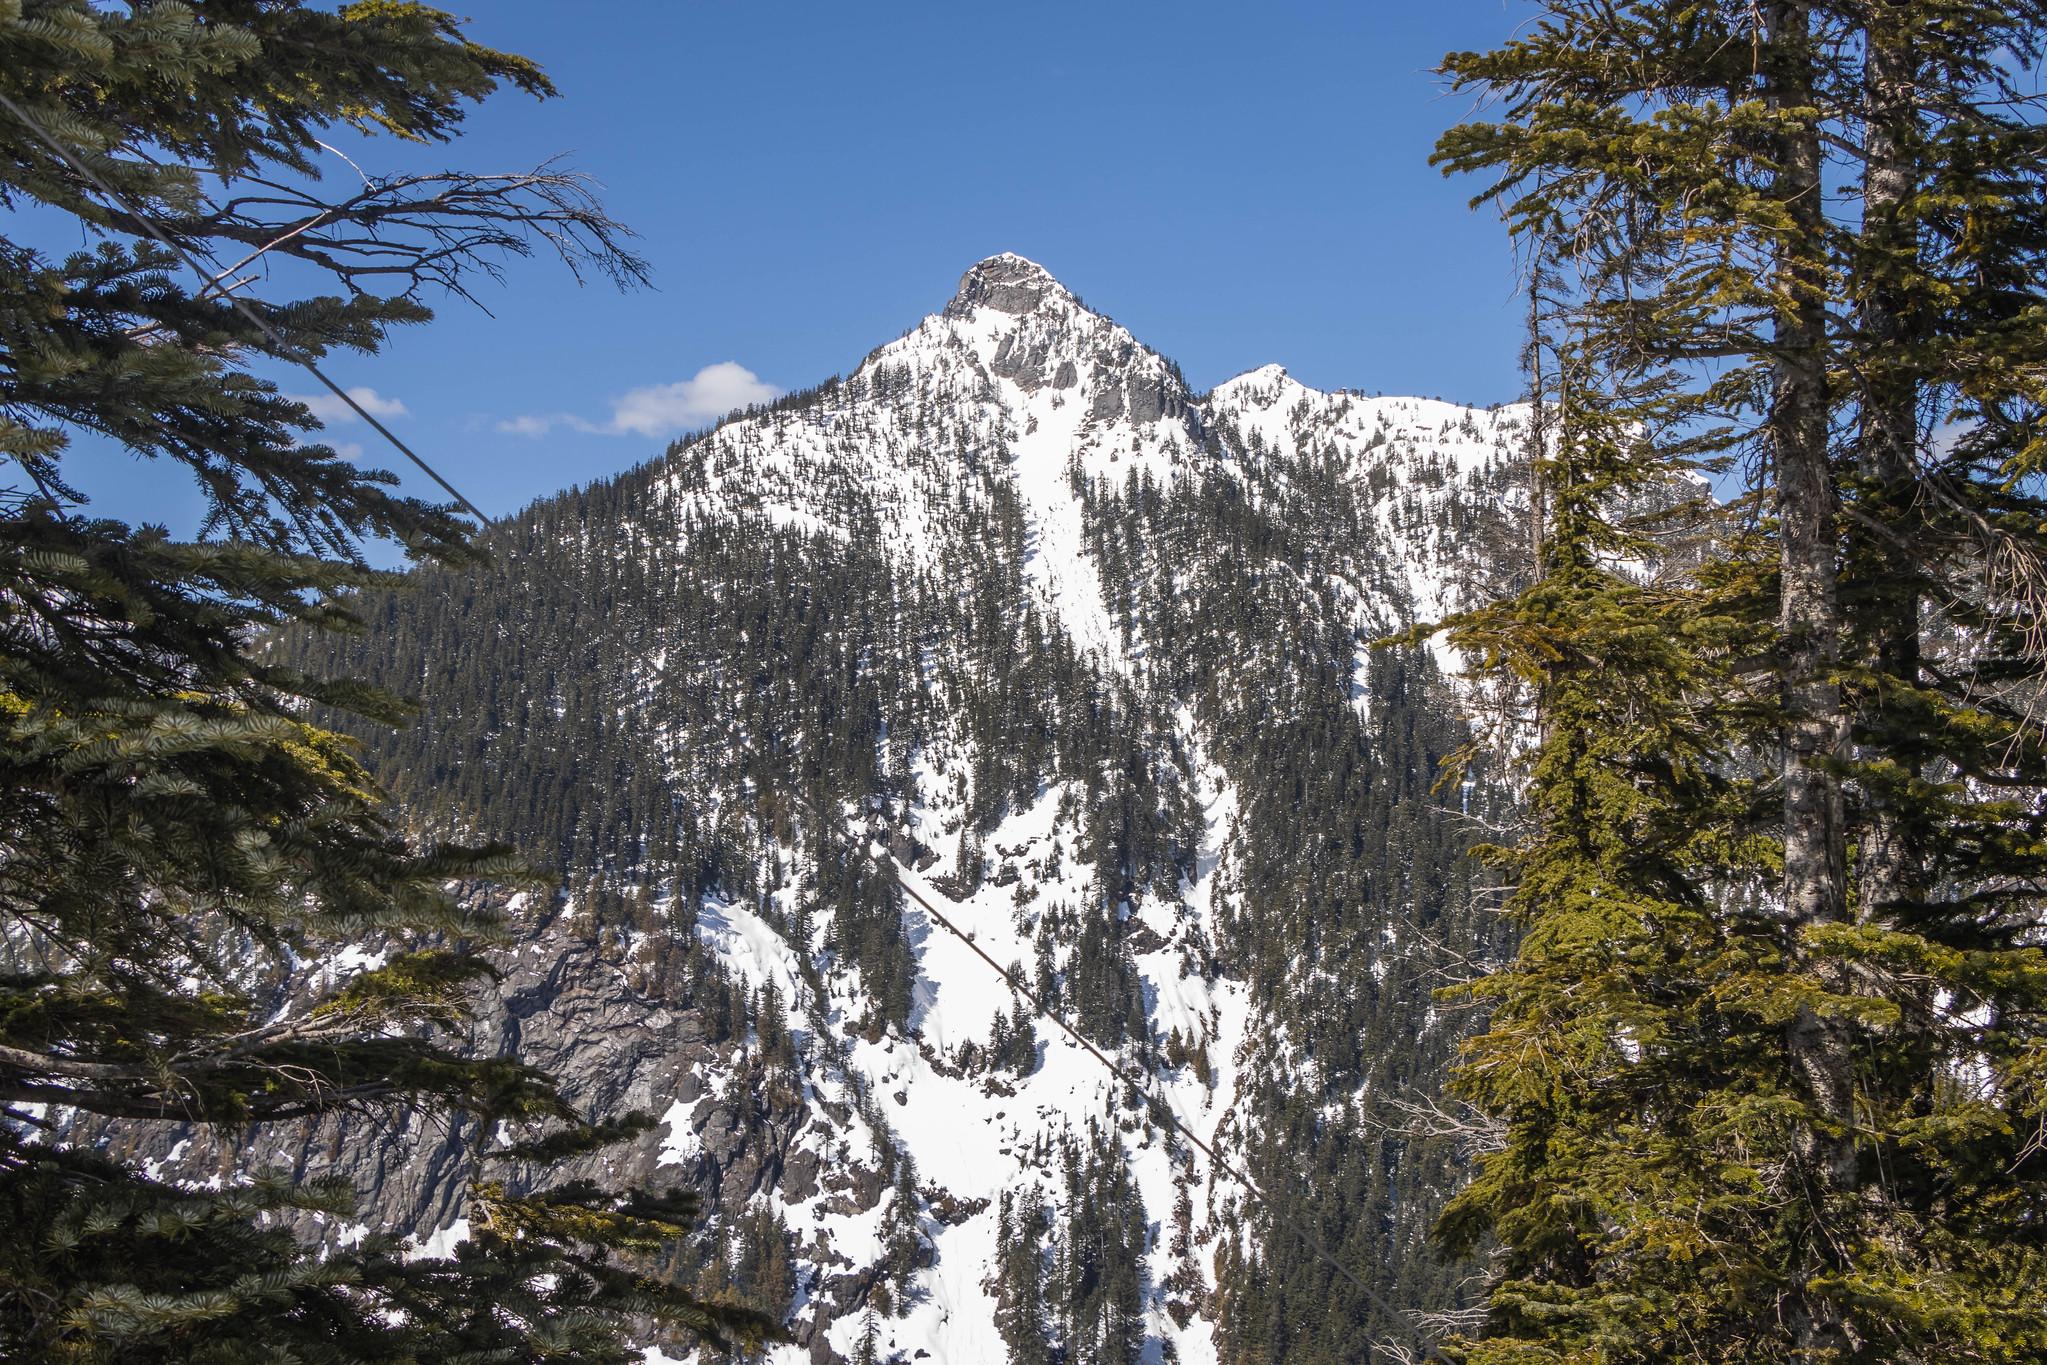 Denny Mountain